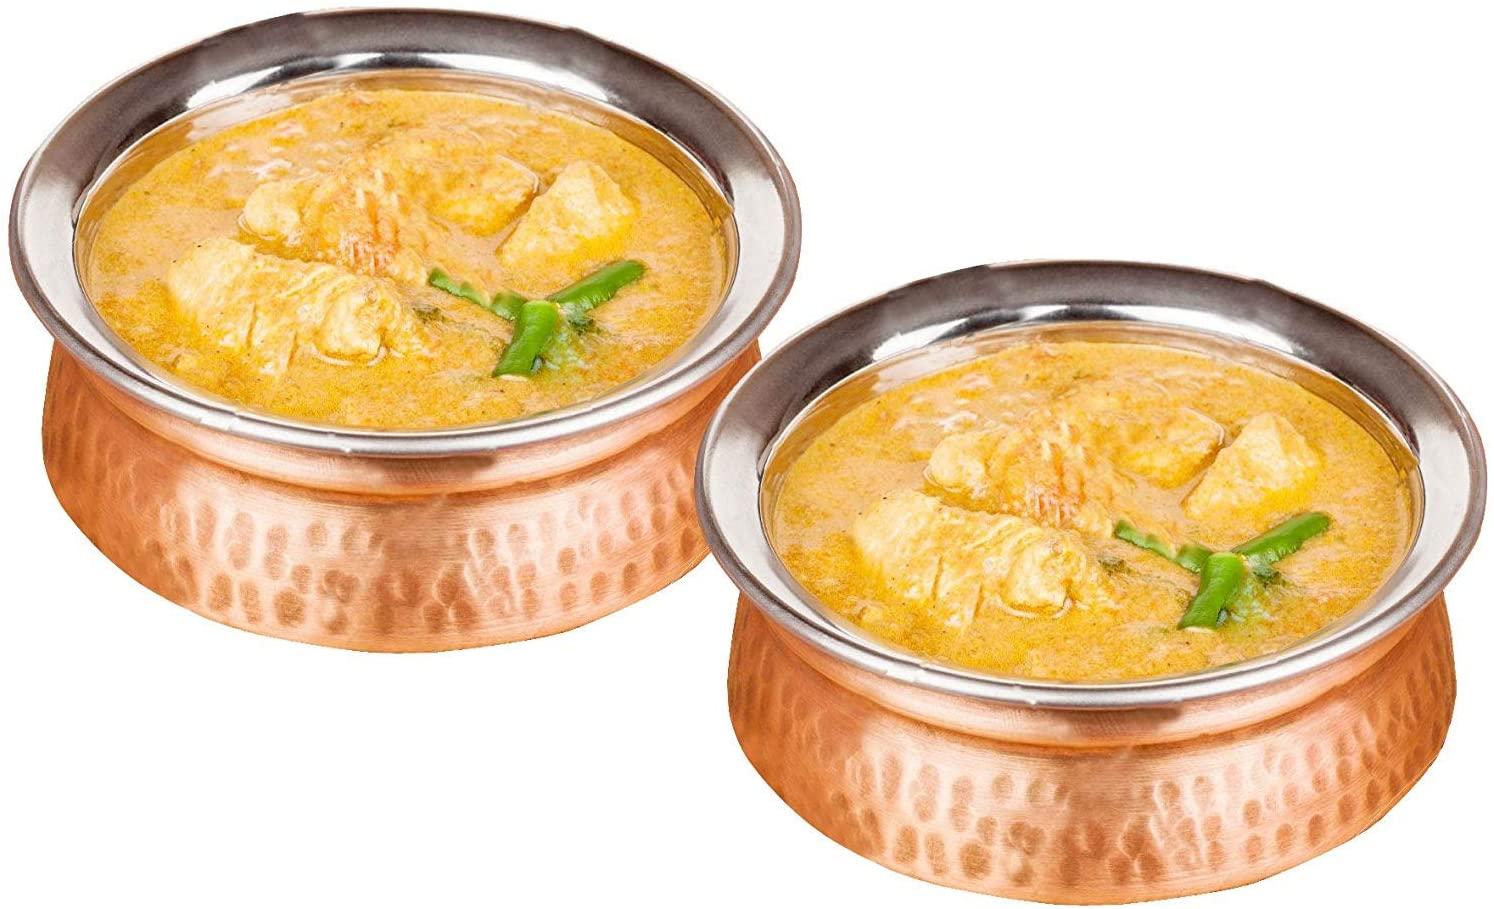 Rastogi Handicrafts Set of 2, Indian Tableware Vegetable Service Bowl for Indian Food, Diameter 6 Inches